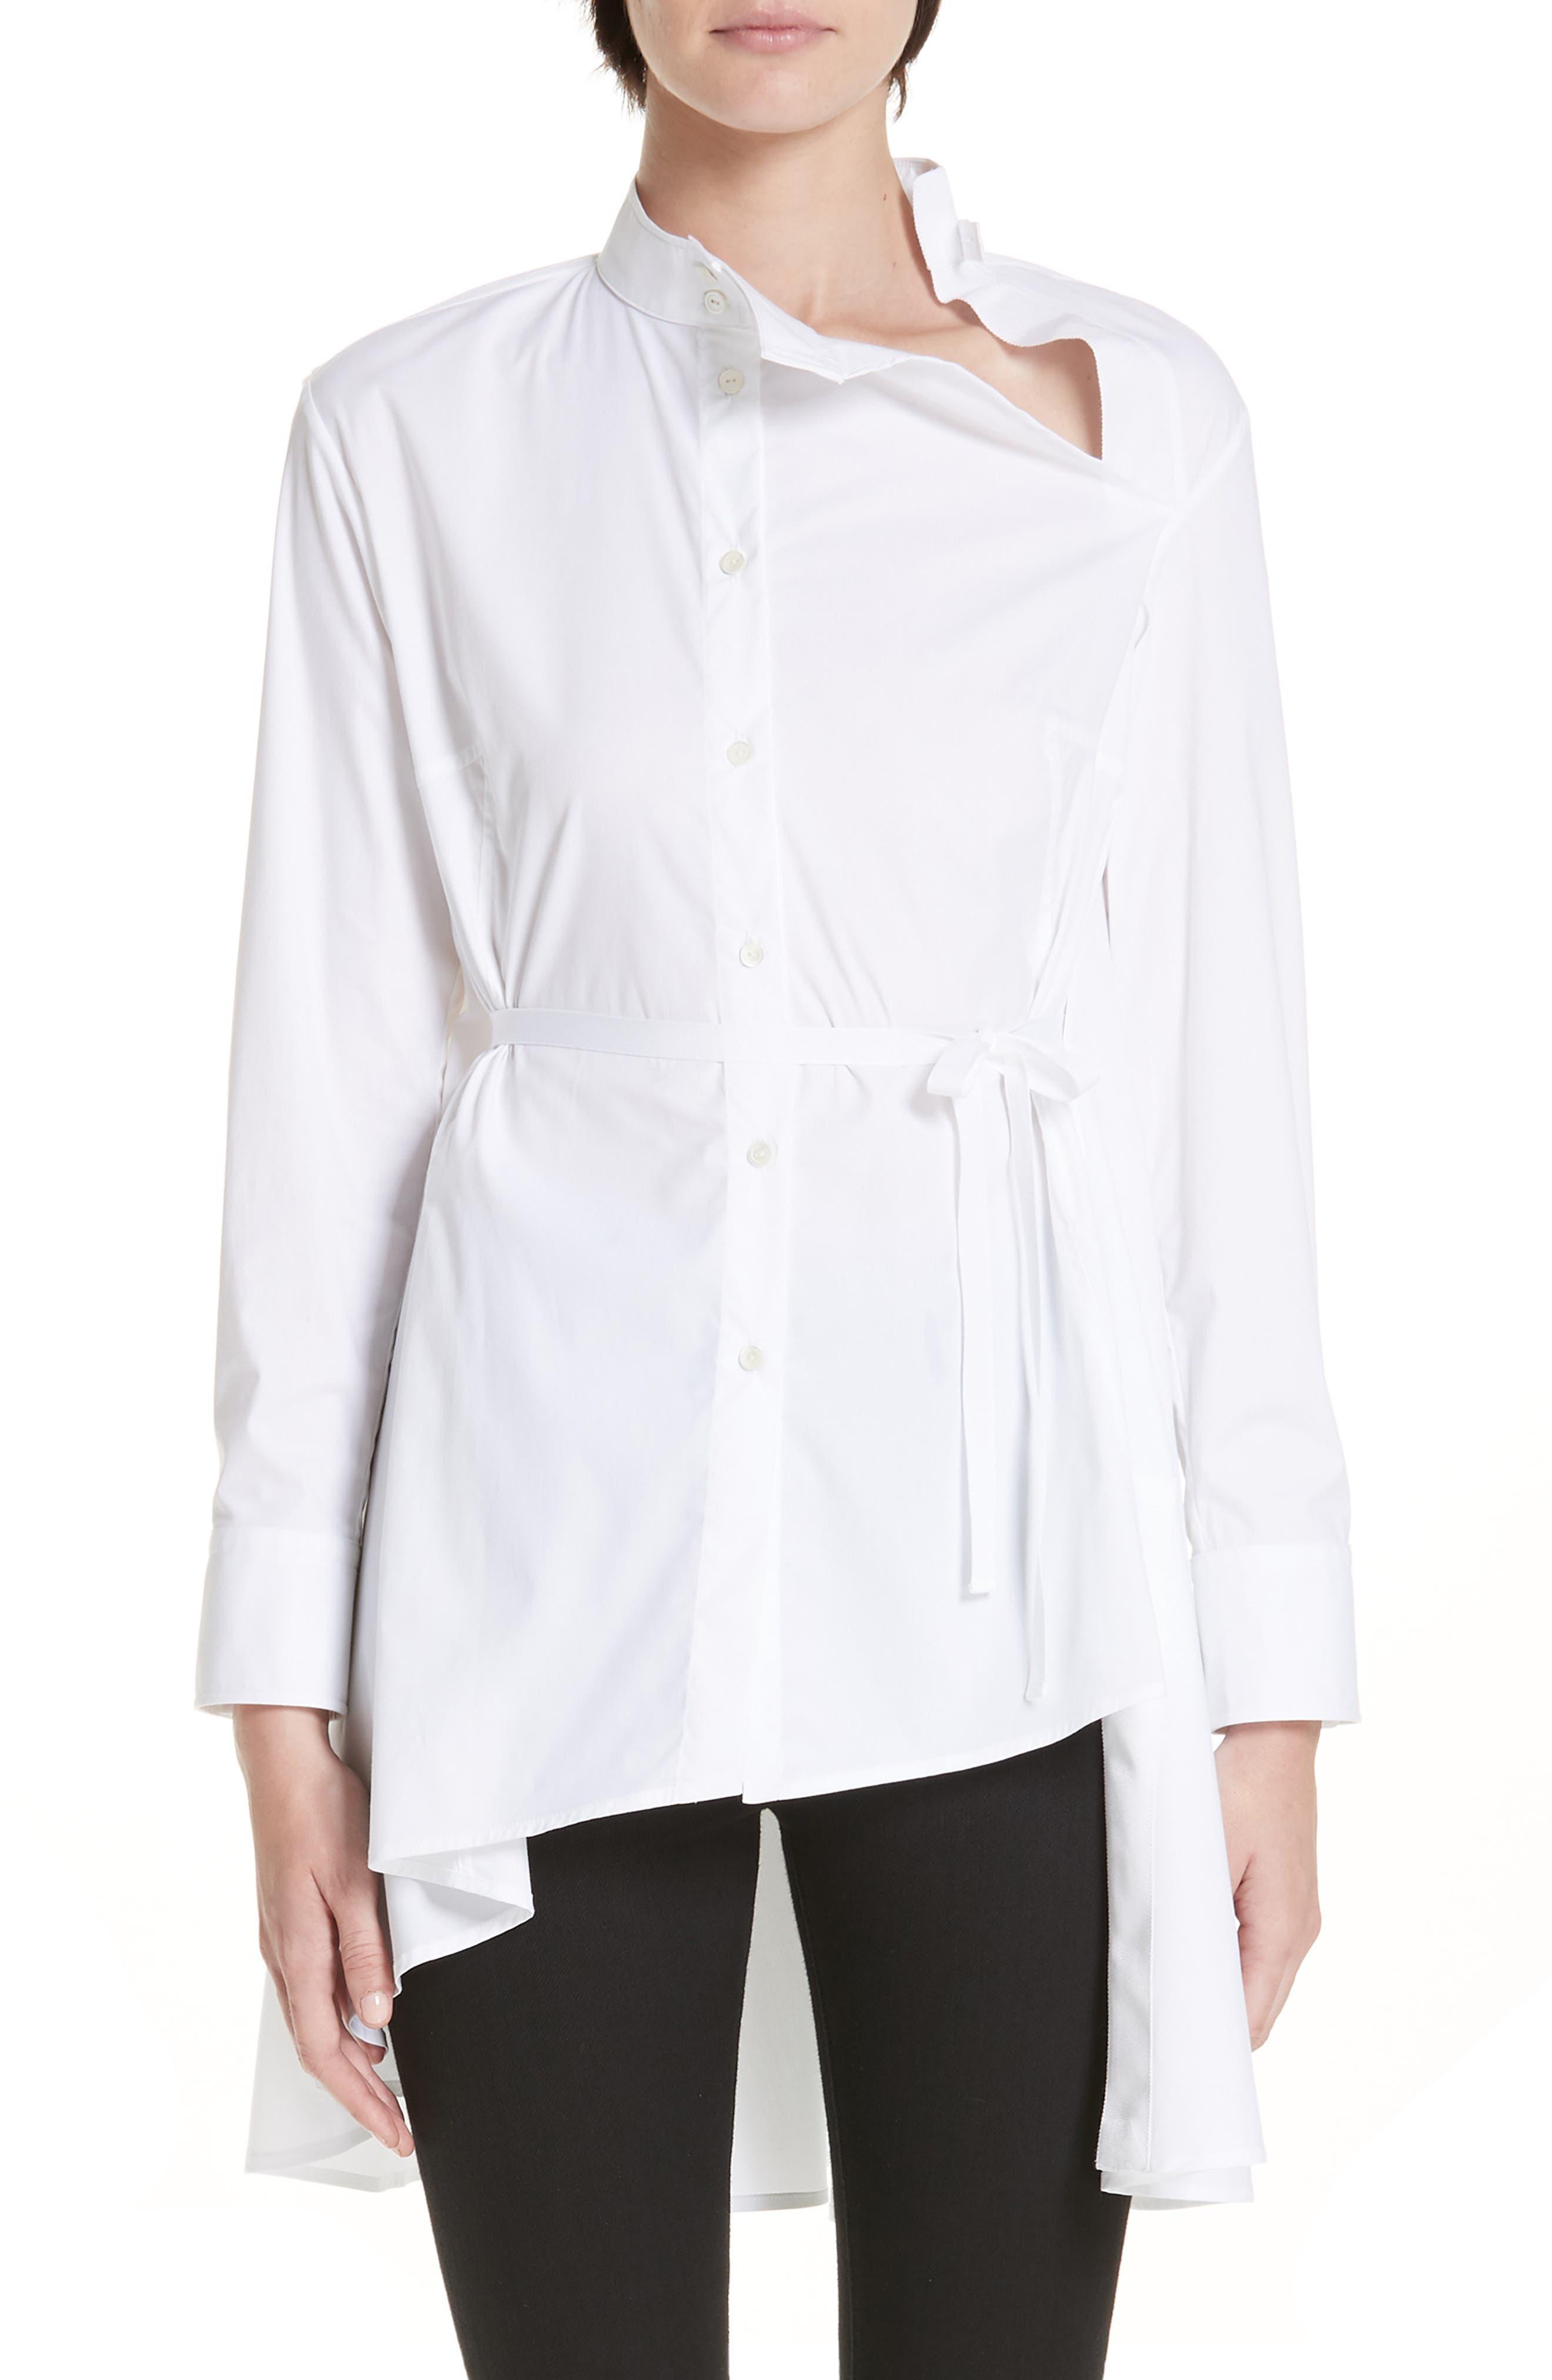 PALMER//HARDING Split Shirt in White Poplin